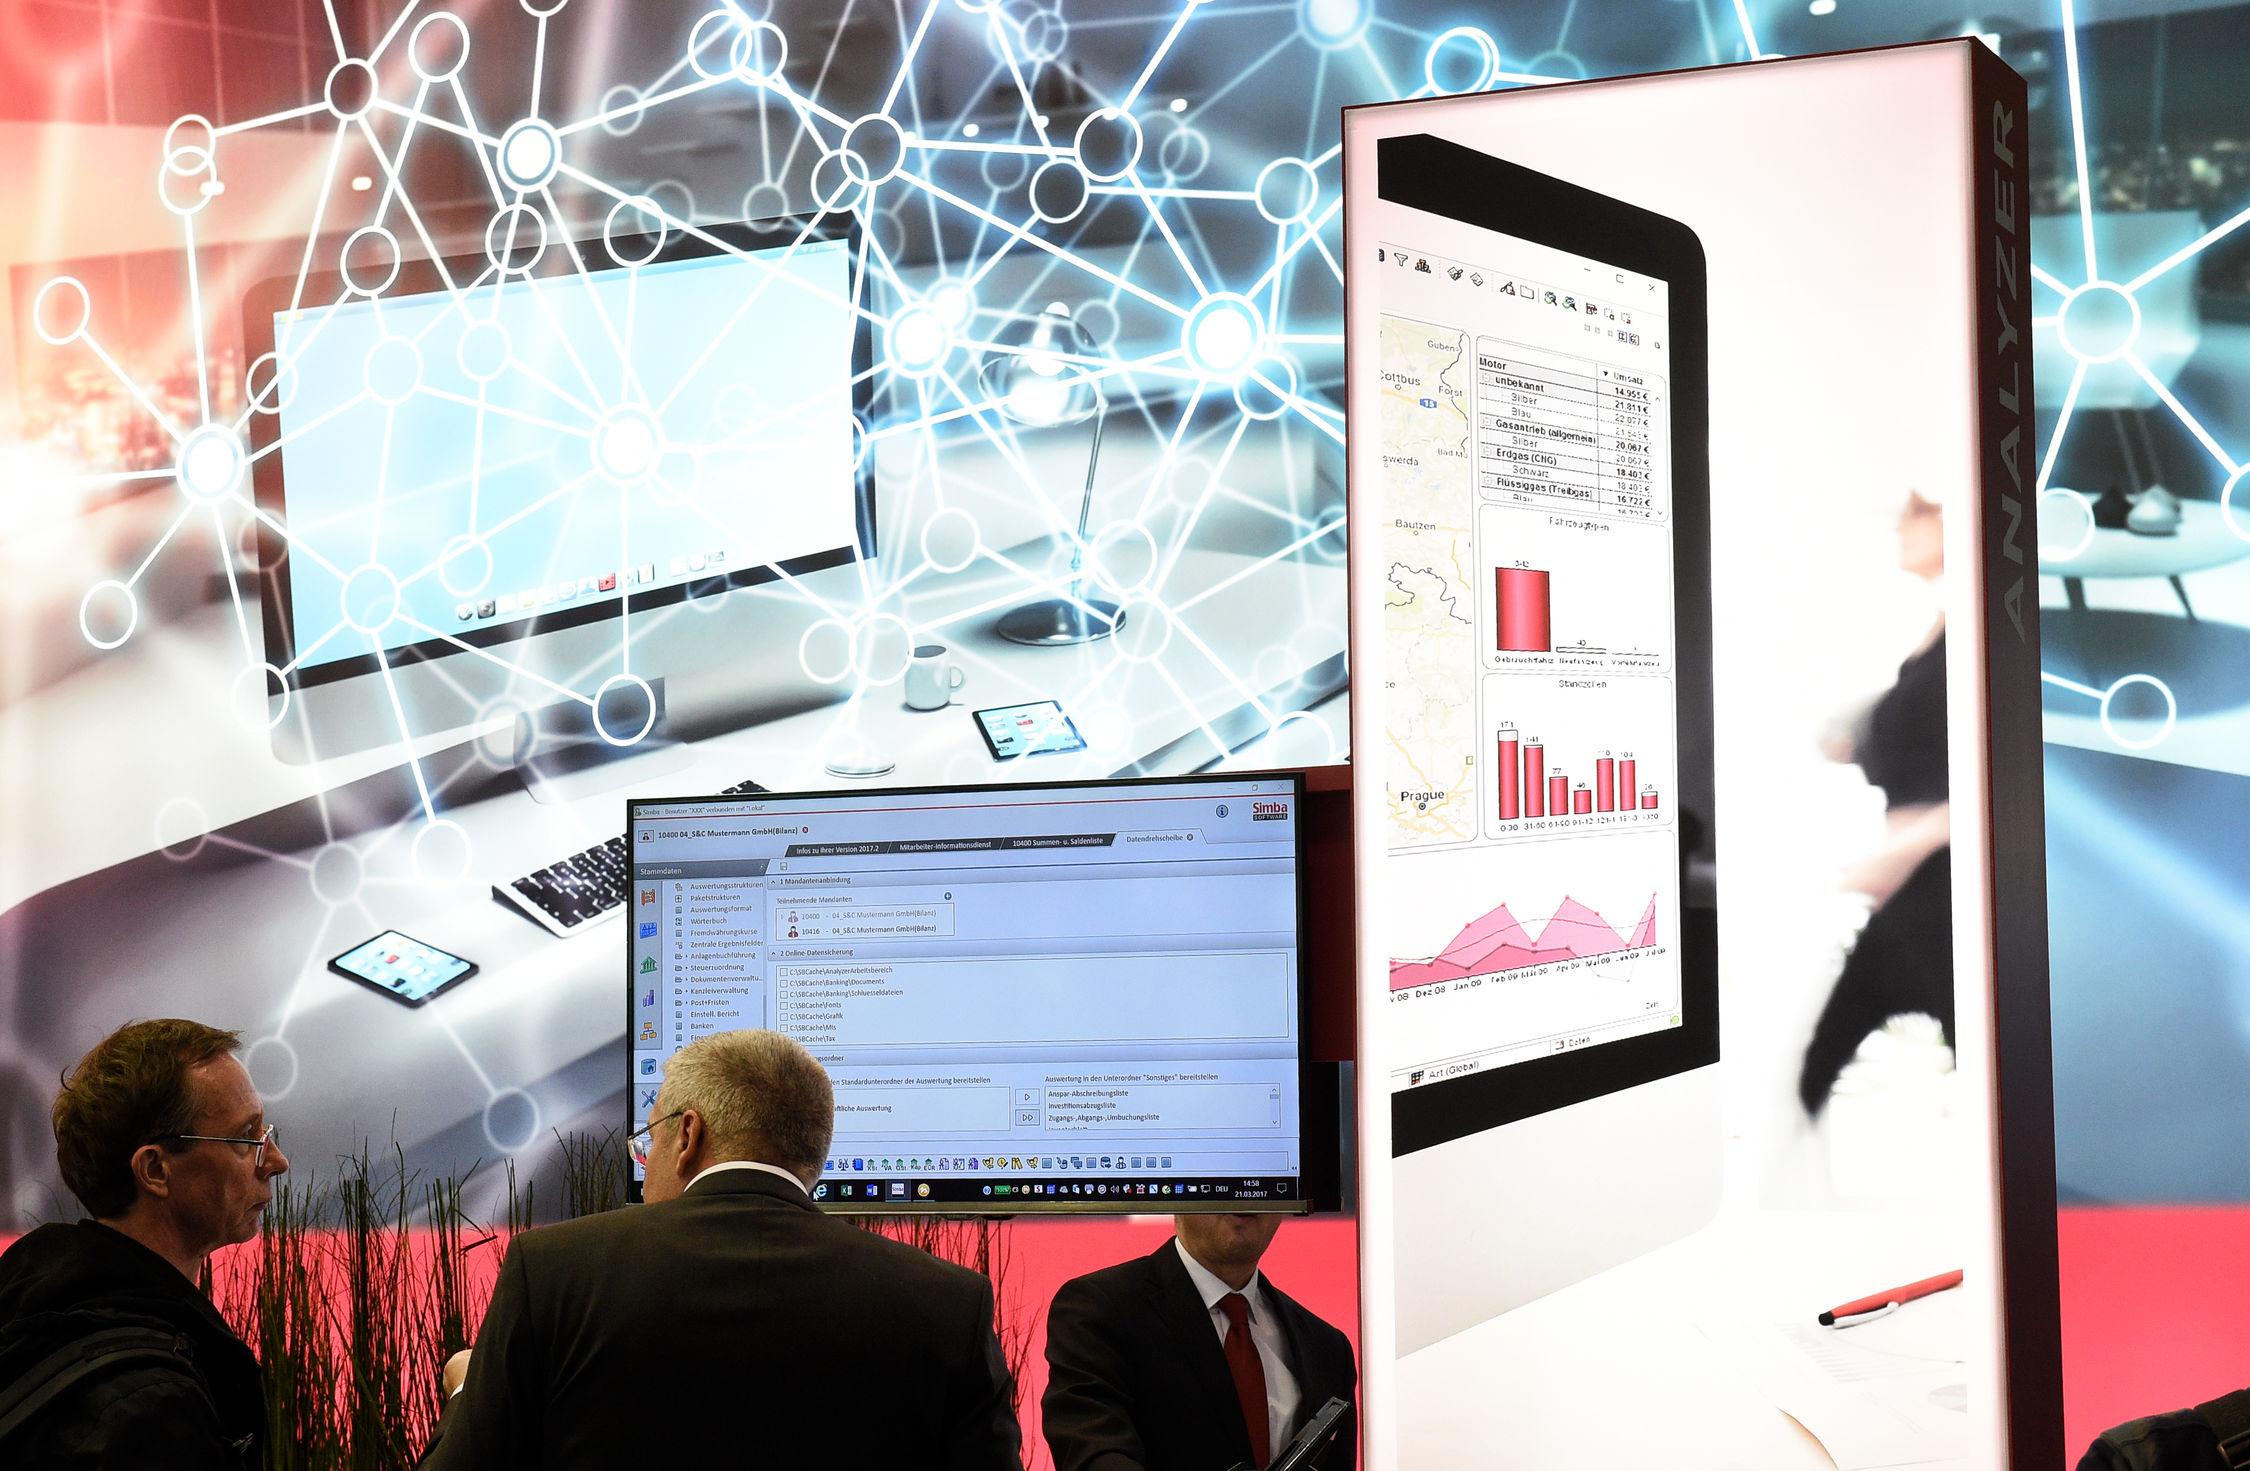 cebit - Work smarter, not harder: CEBIT 2018 macht fit fürs Digital Office